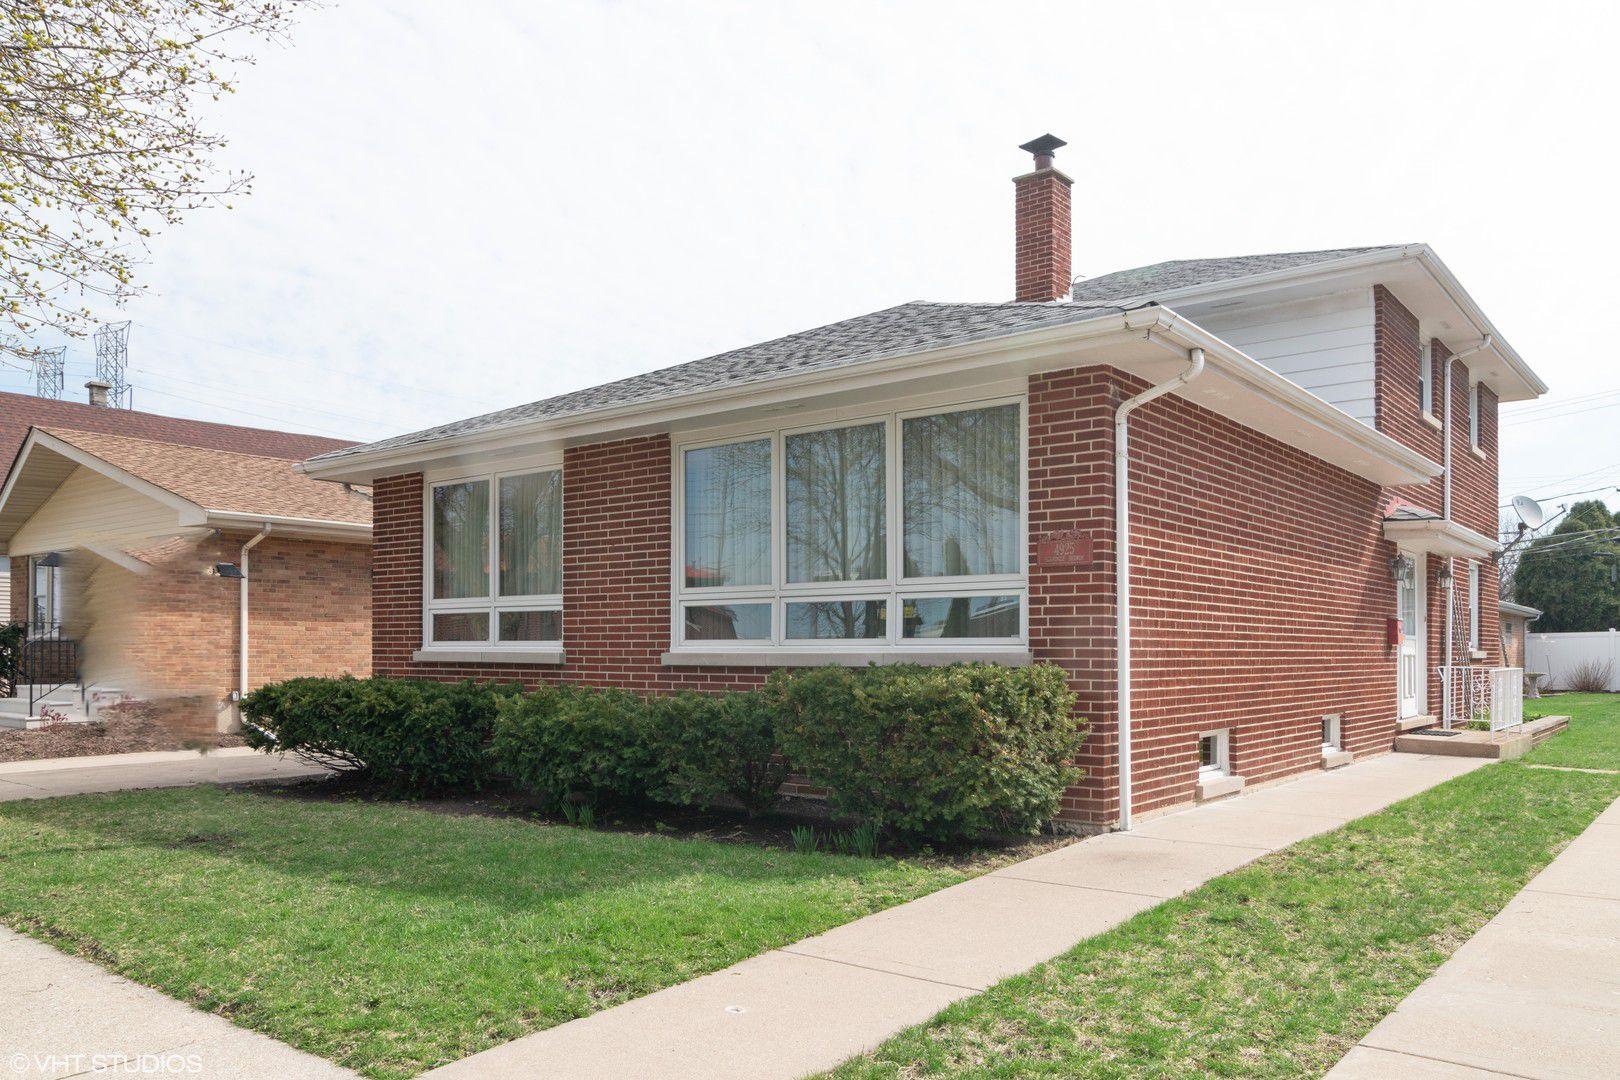 4925 Egandale Ave, Mc Cook, IL 60525 - 4 Bed, 2 Bath Single-Family Home -  MLS #10329785 - 11 Photos | Trulia